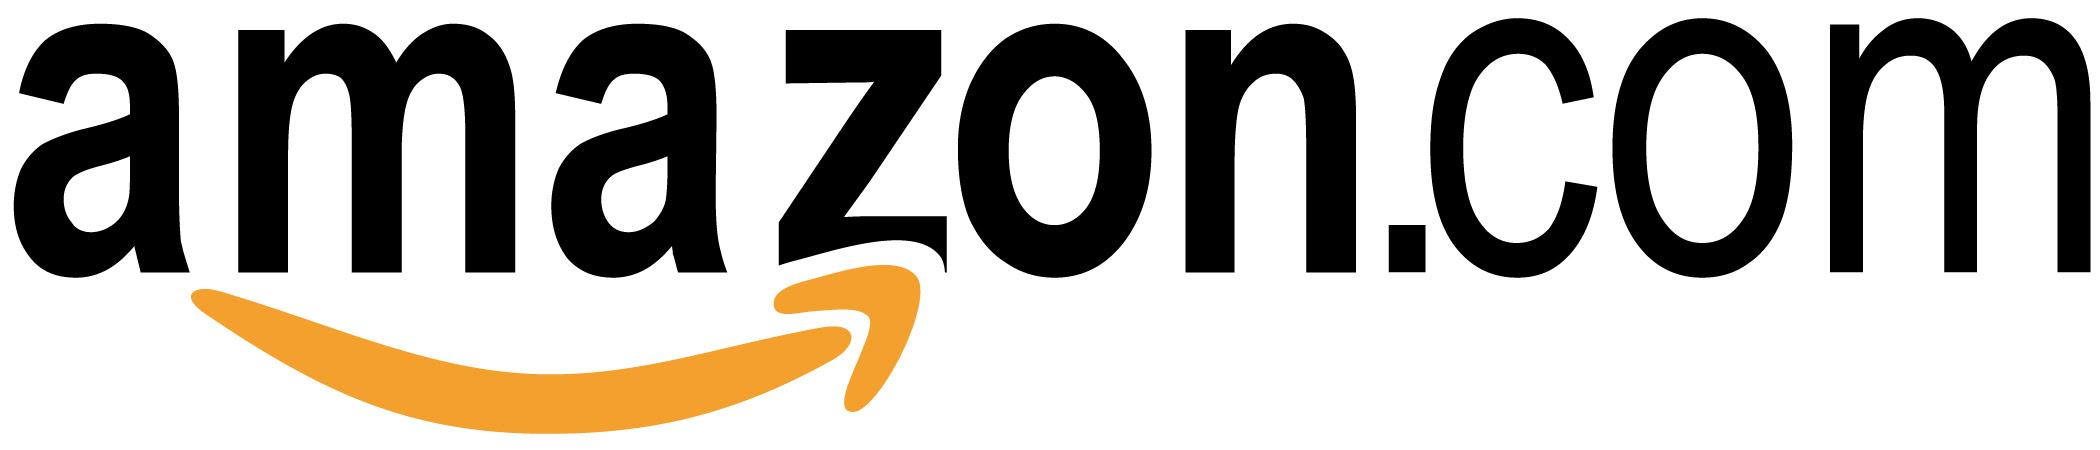 amazon logo vector. amazon logo vector g - Amazon Logo Vector PNG